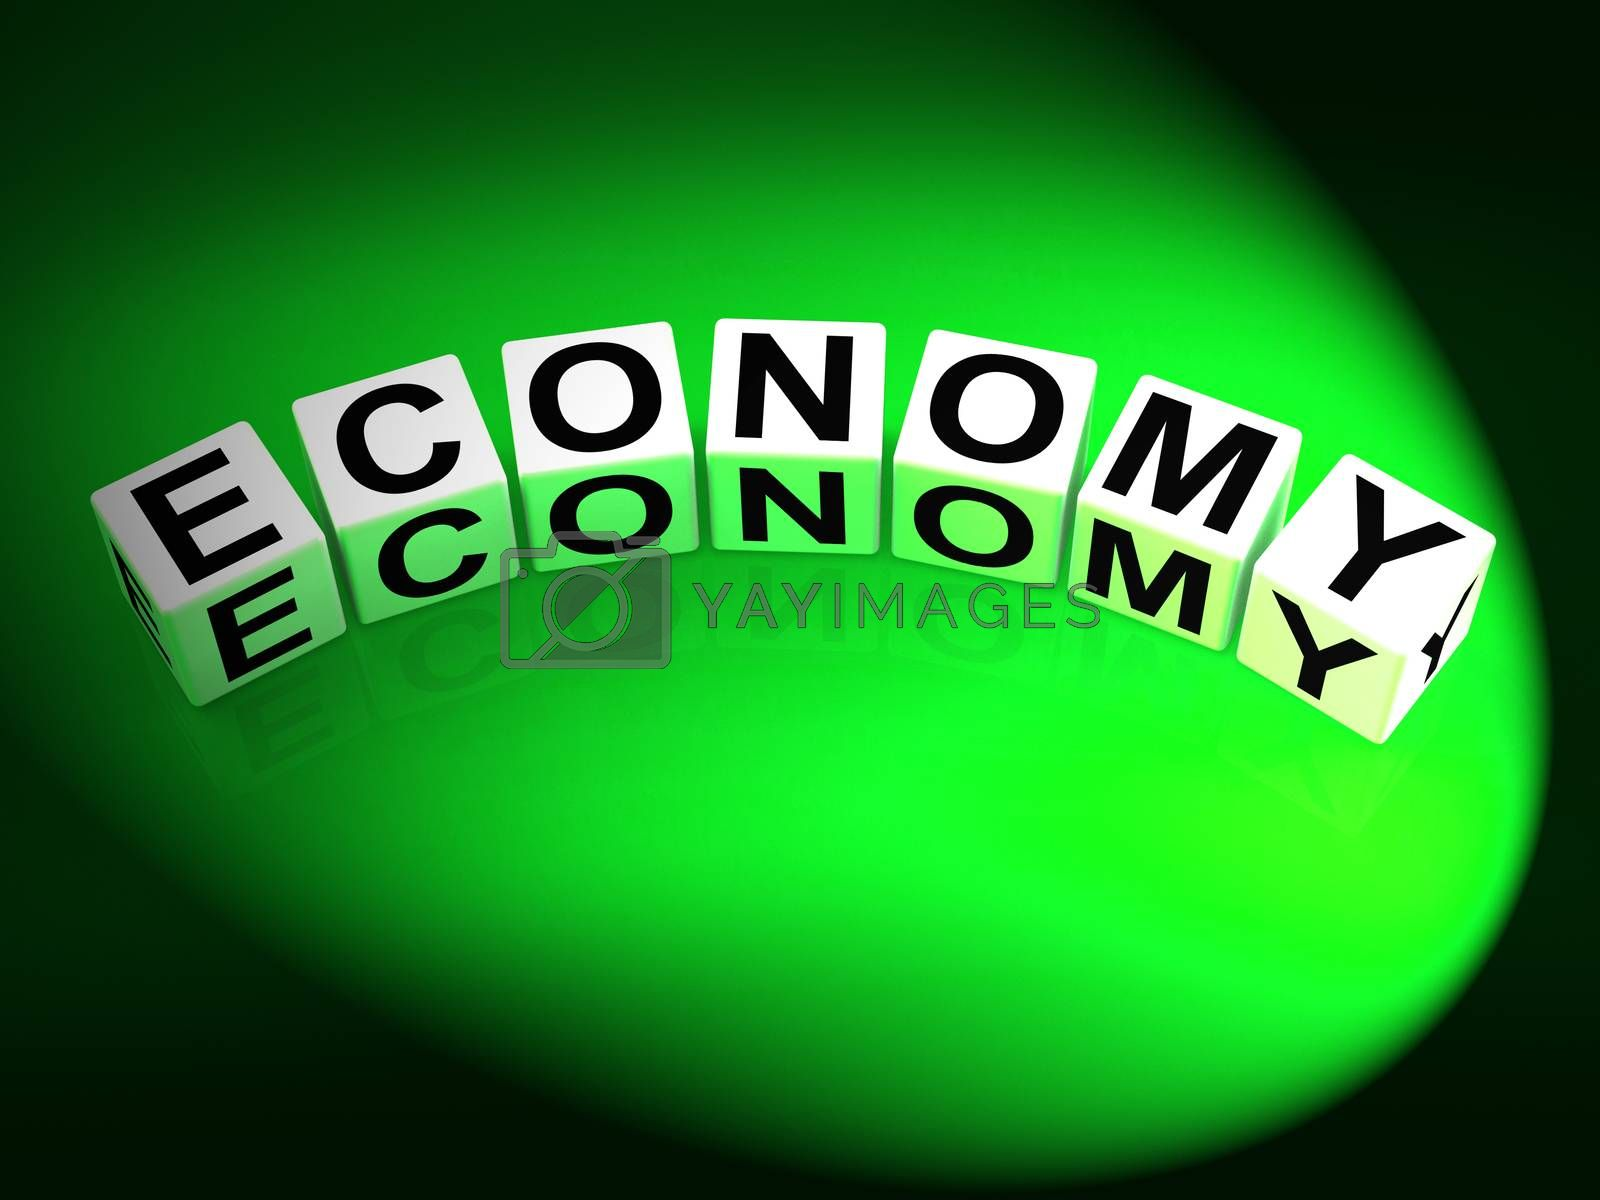 Economy Dice Show Monetary and Economic Predictions by stuartmiles